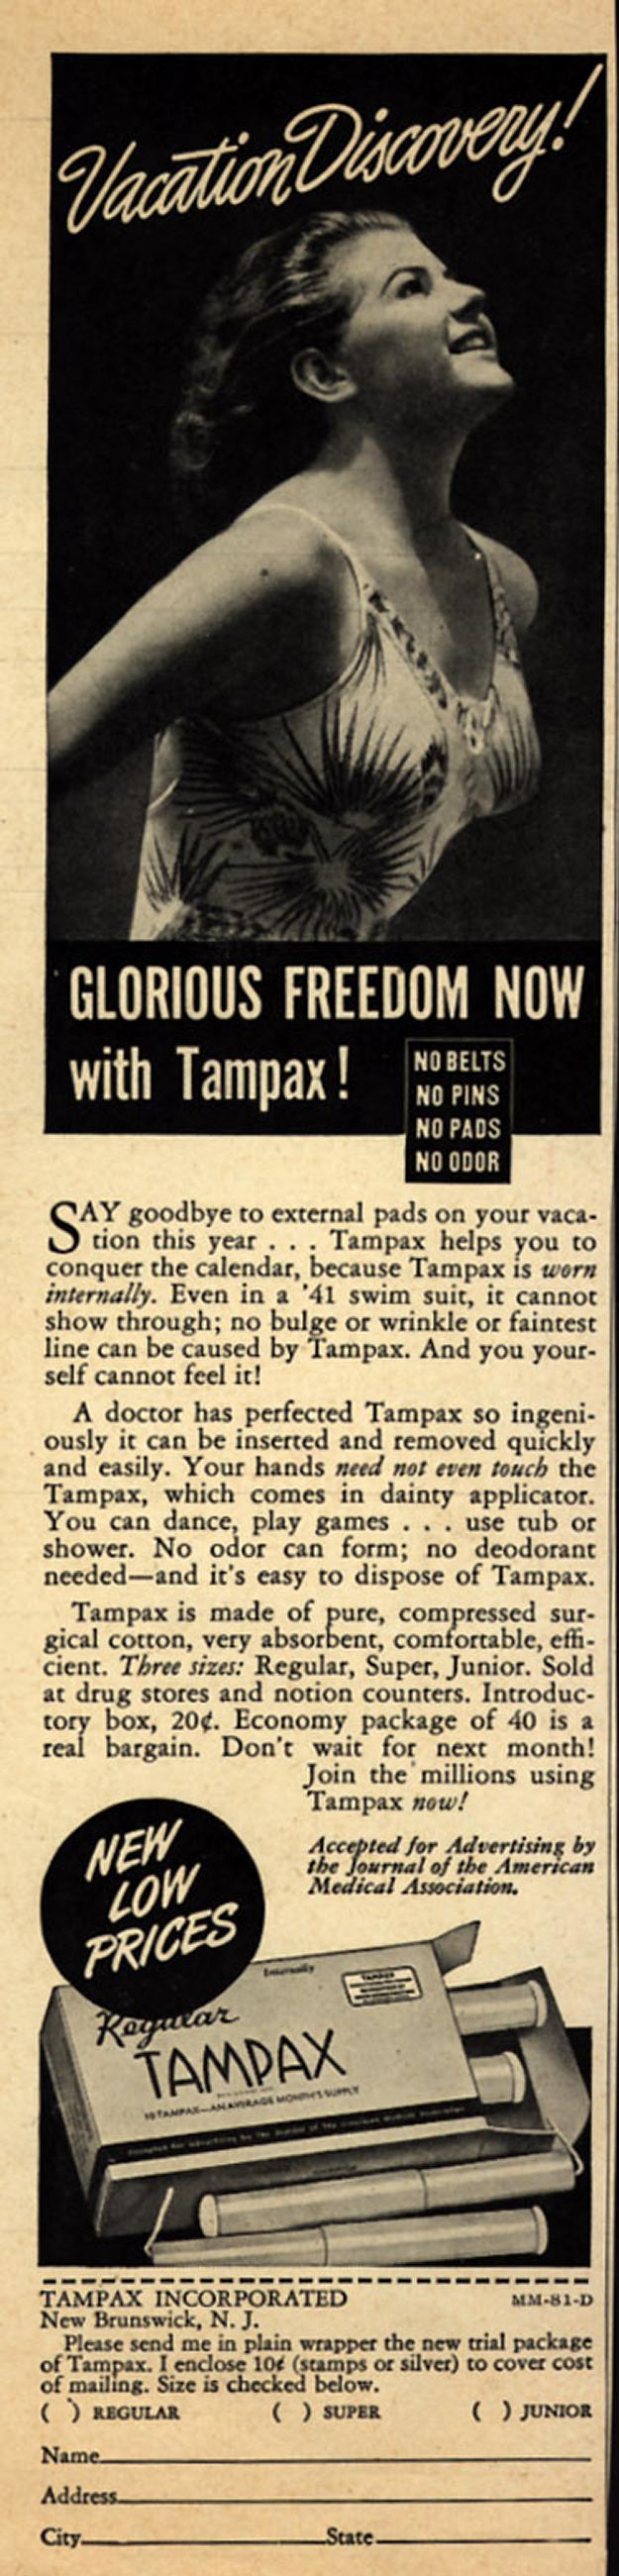 Tampax Inc., 1941